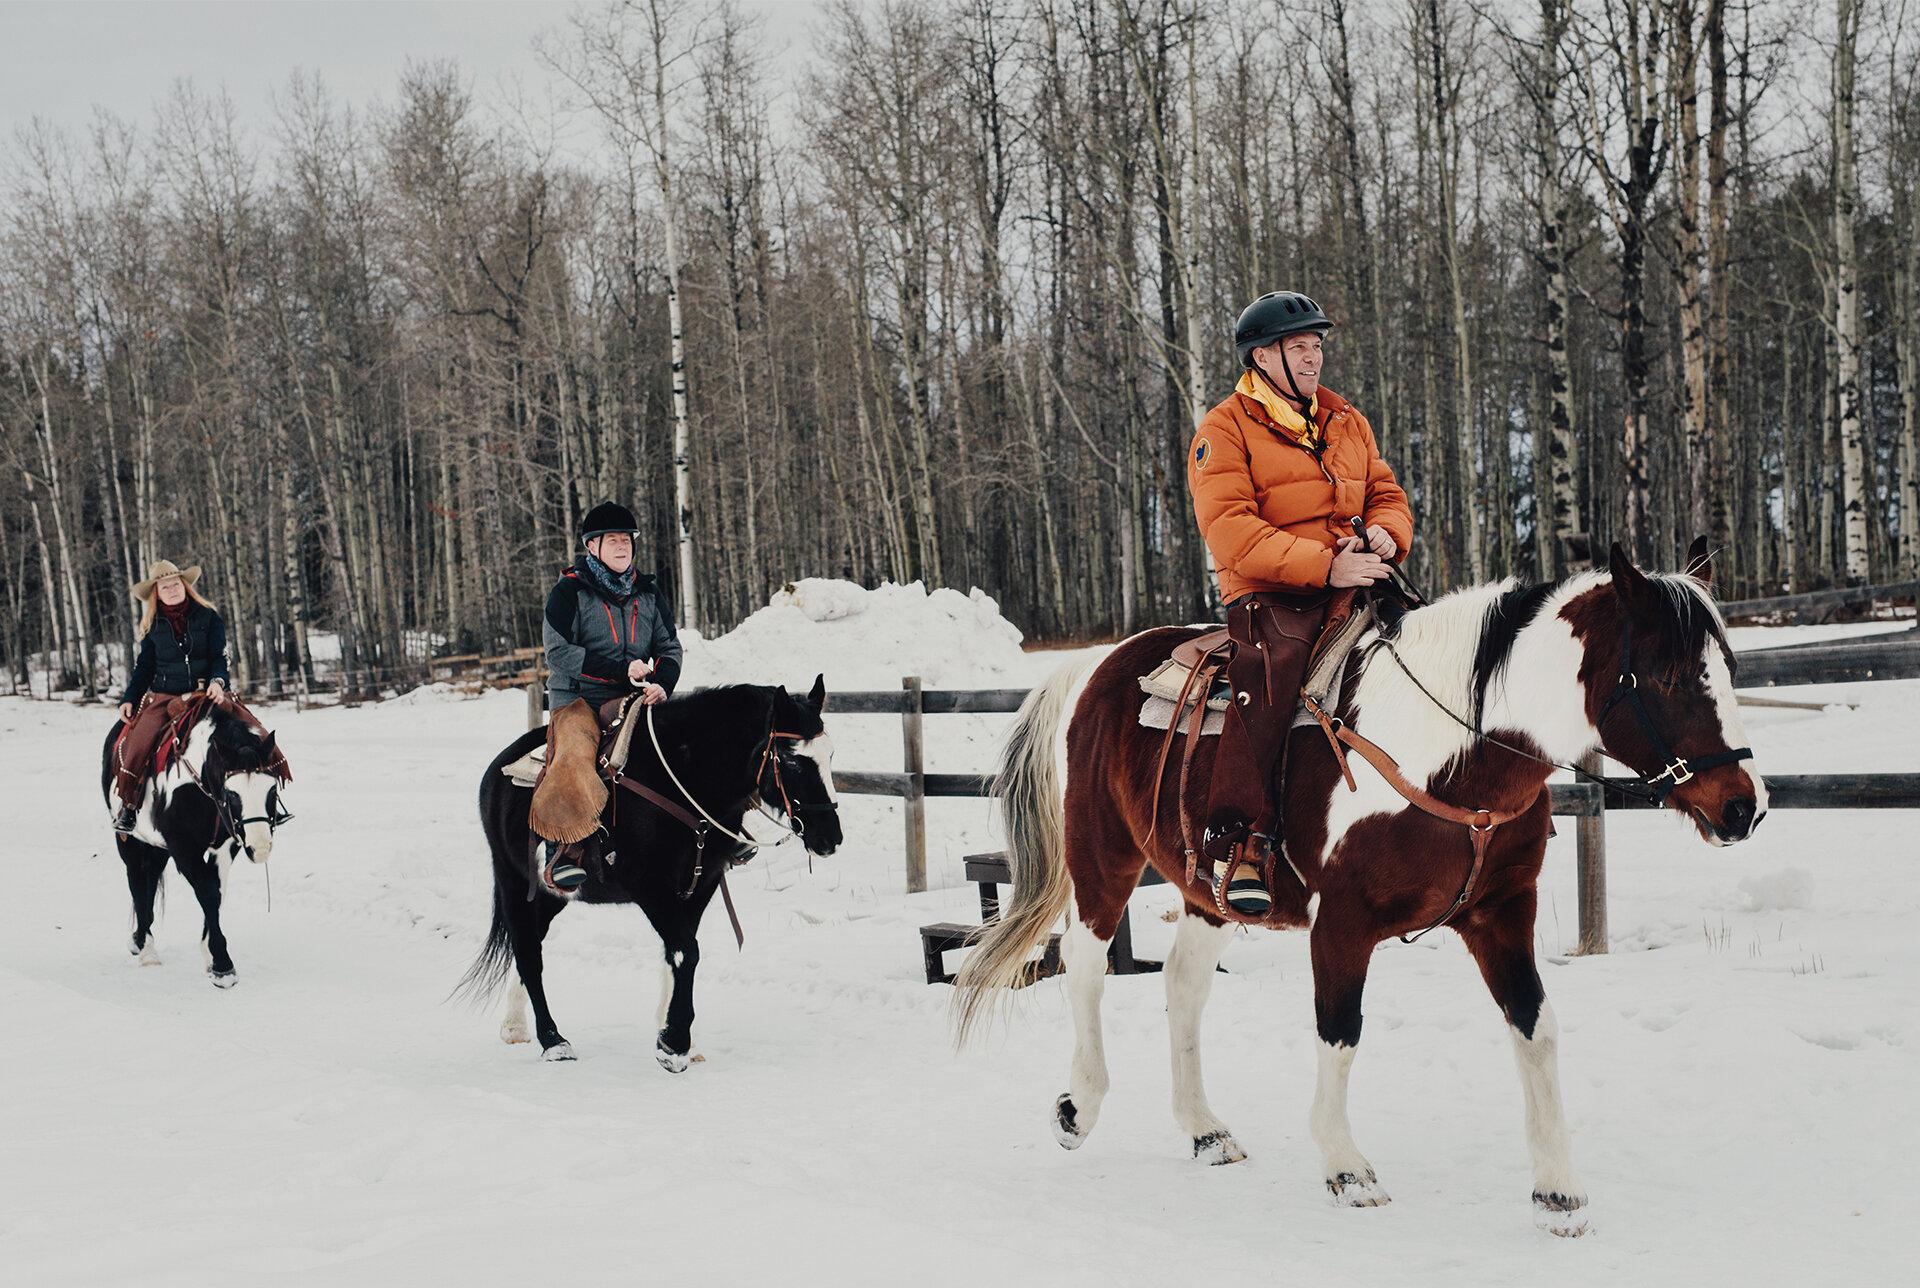 AB_Rob Scheer_Horseback Riding.jpg